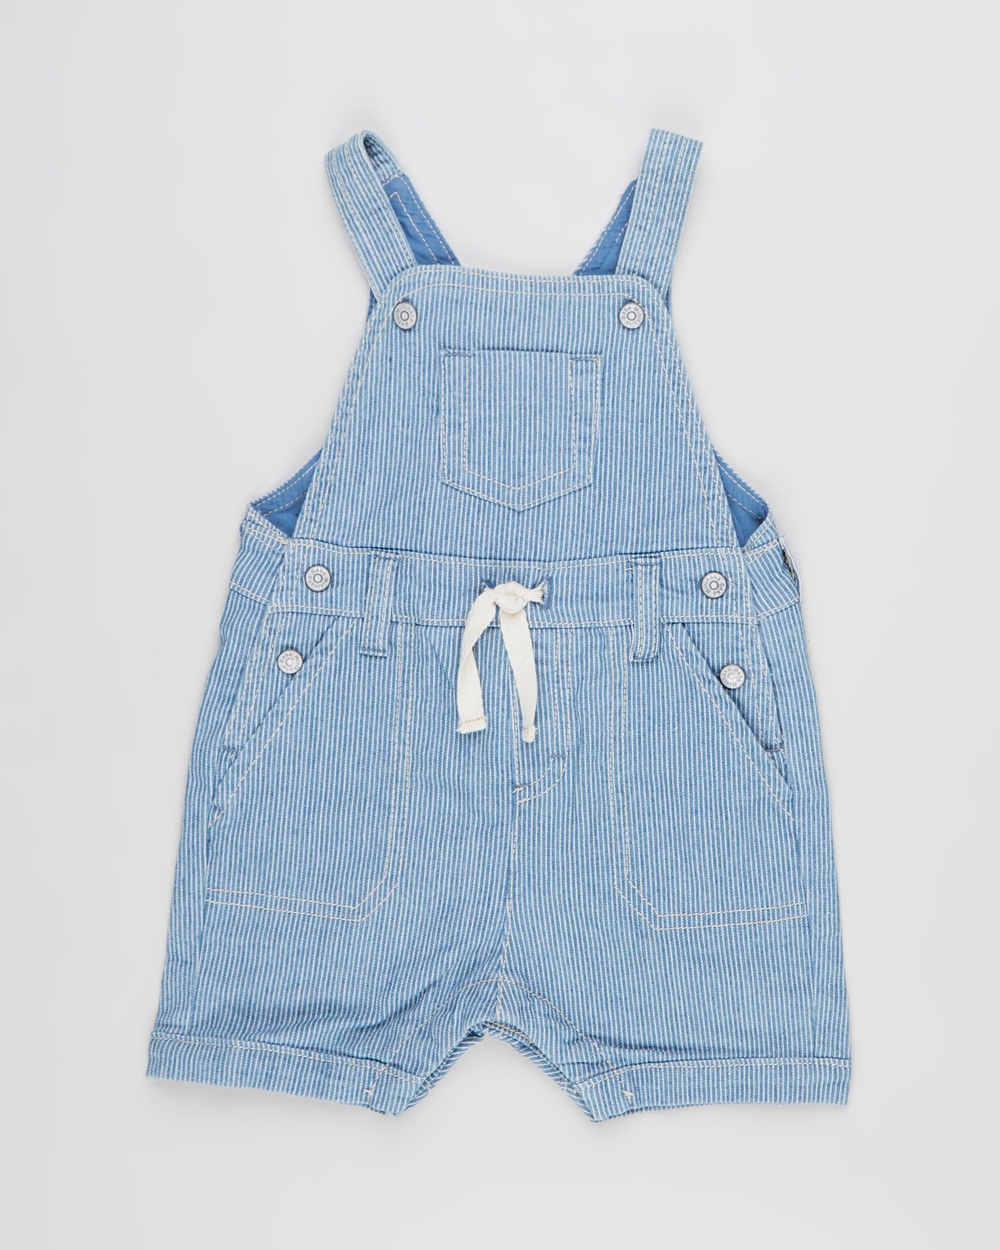 Bebe by Minihaha Oscar Denim Stripe Overalls Babies Jumpsuits & Playsuits Indigo